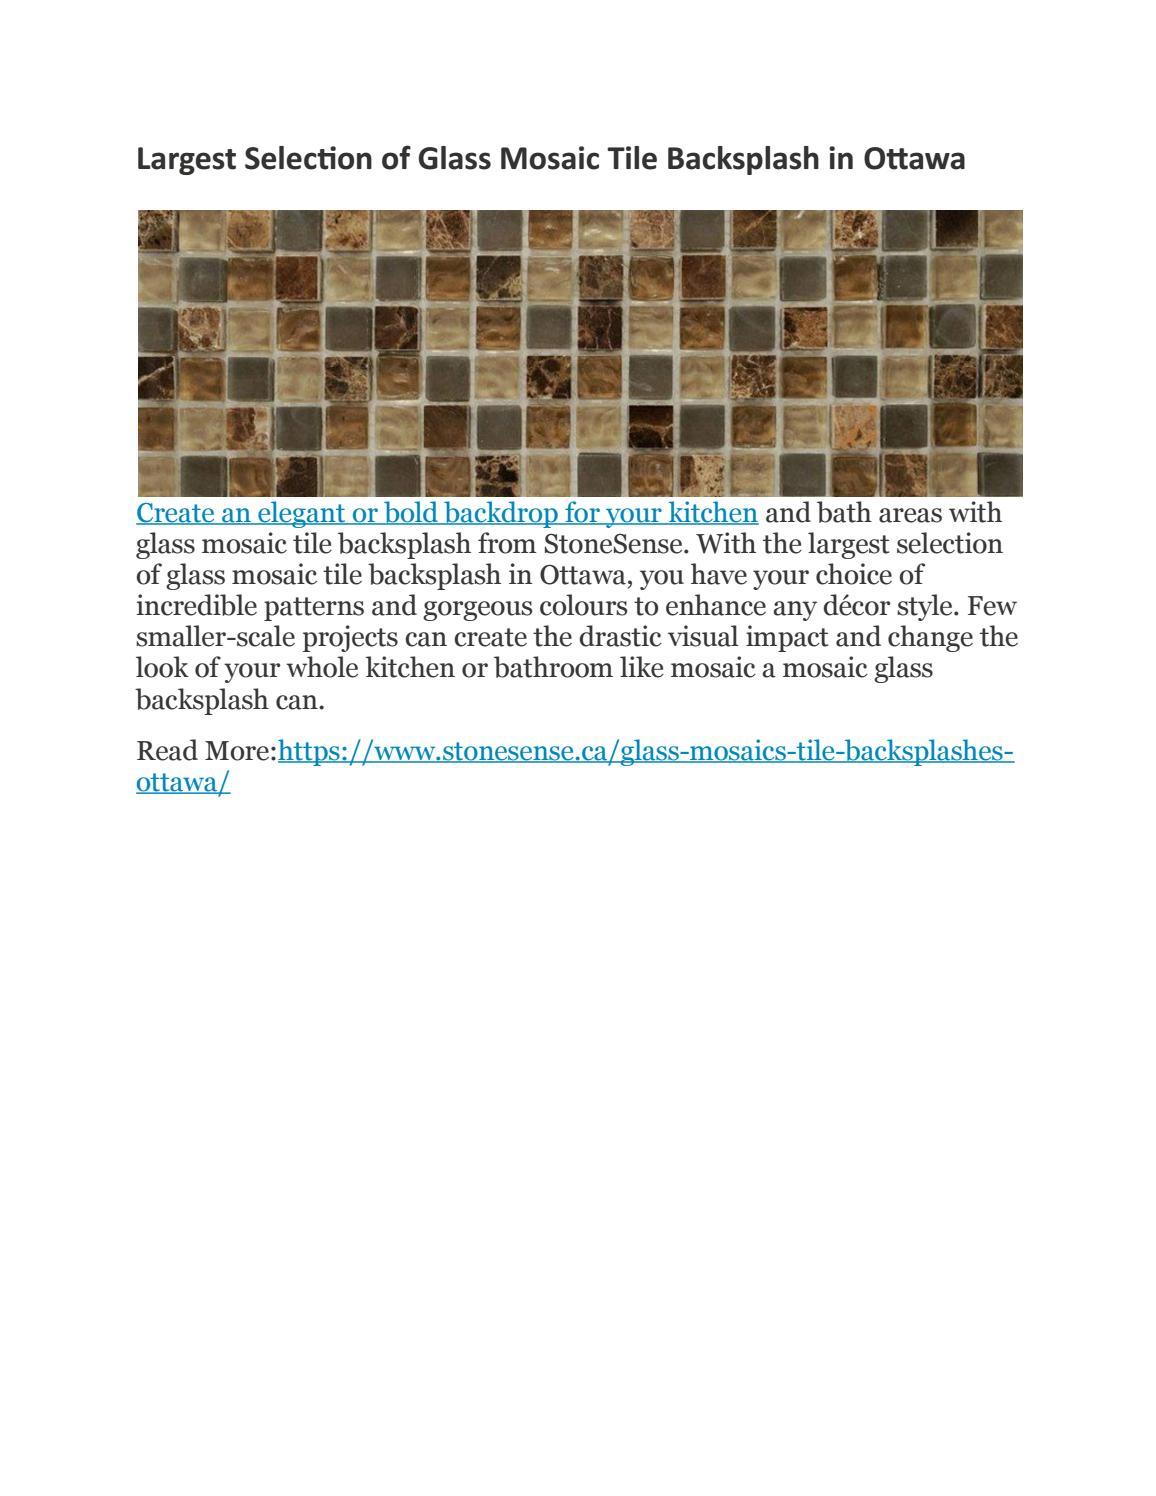 Largest Selection Of Glass Mosaic Tile Backsplash In Ottawa By